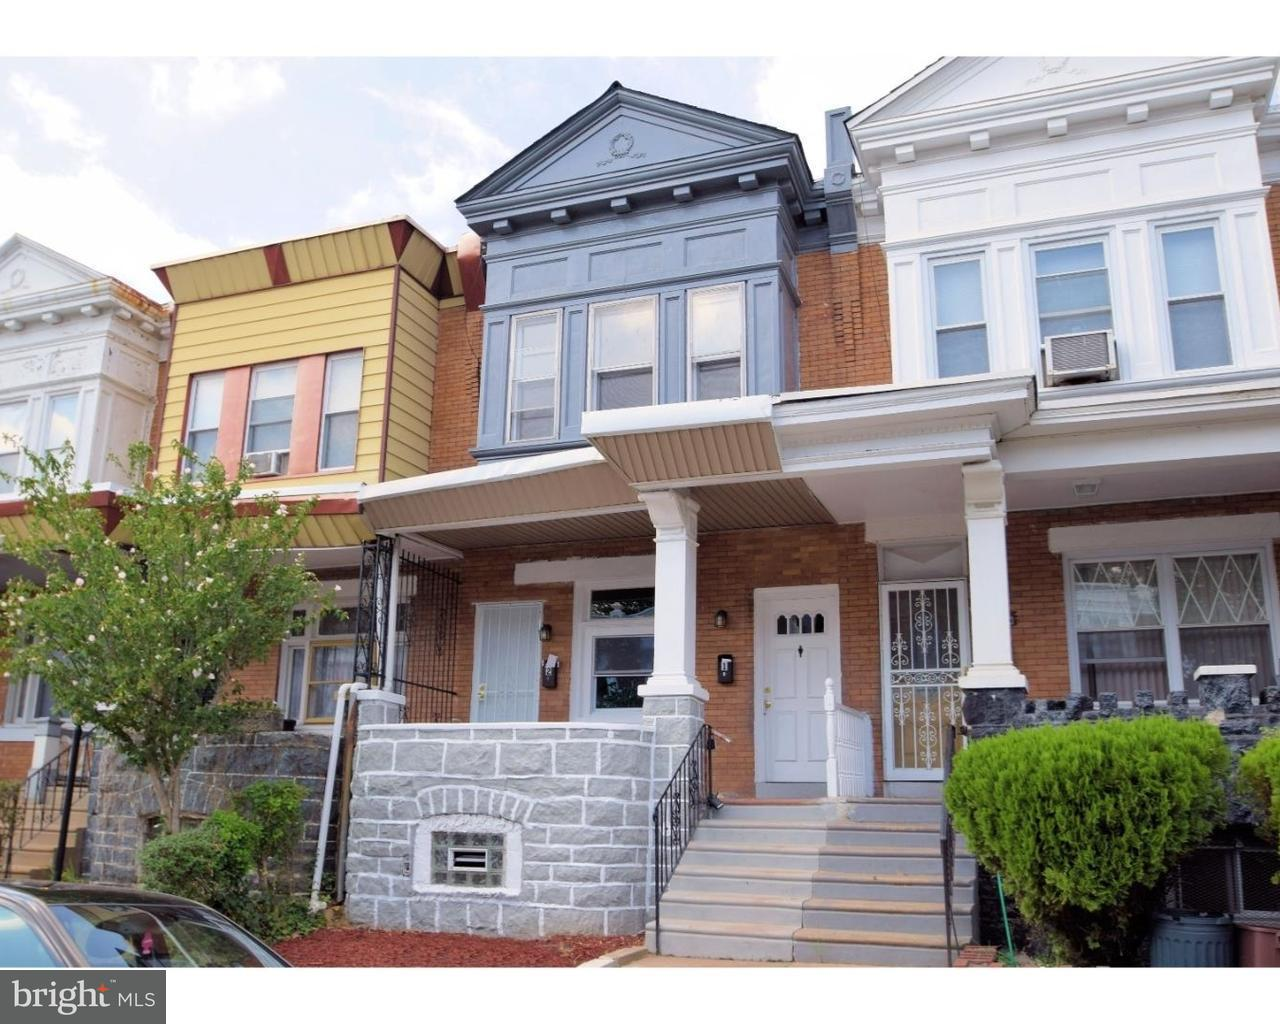 4938 N Warnock Street #1 Philadelphia, PA 19141